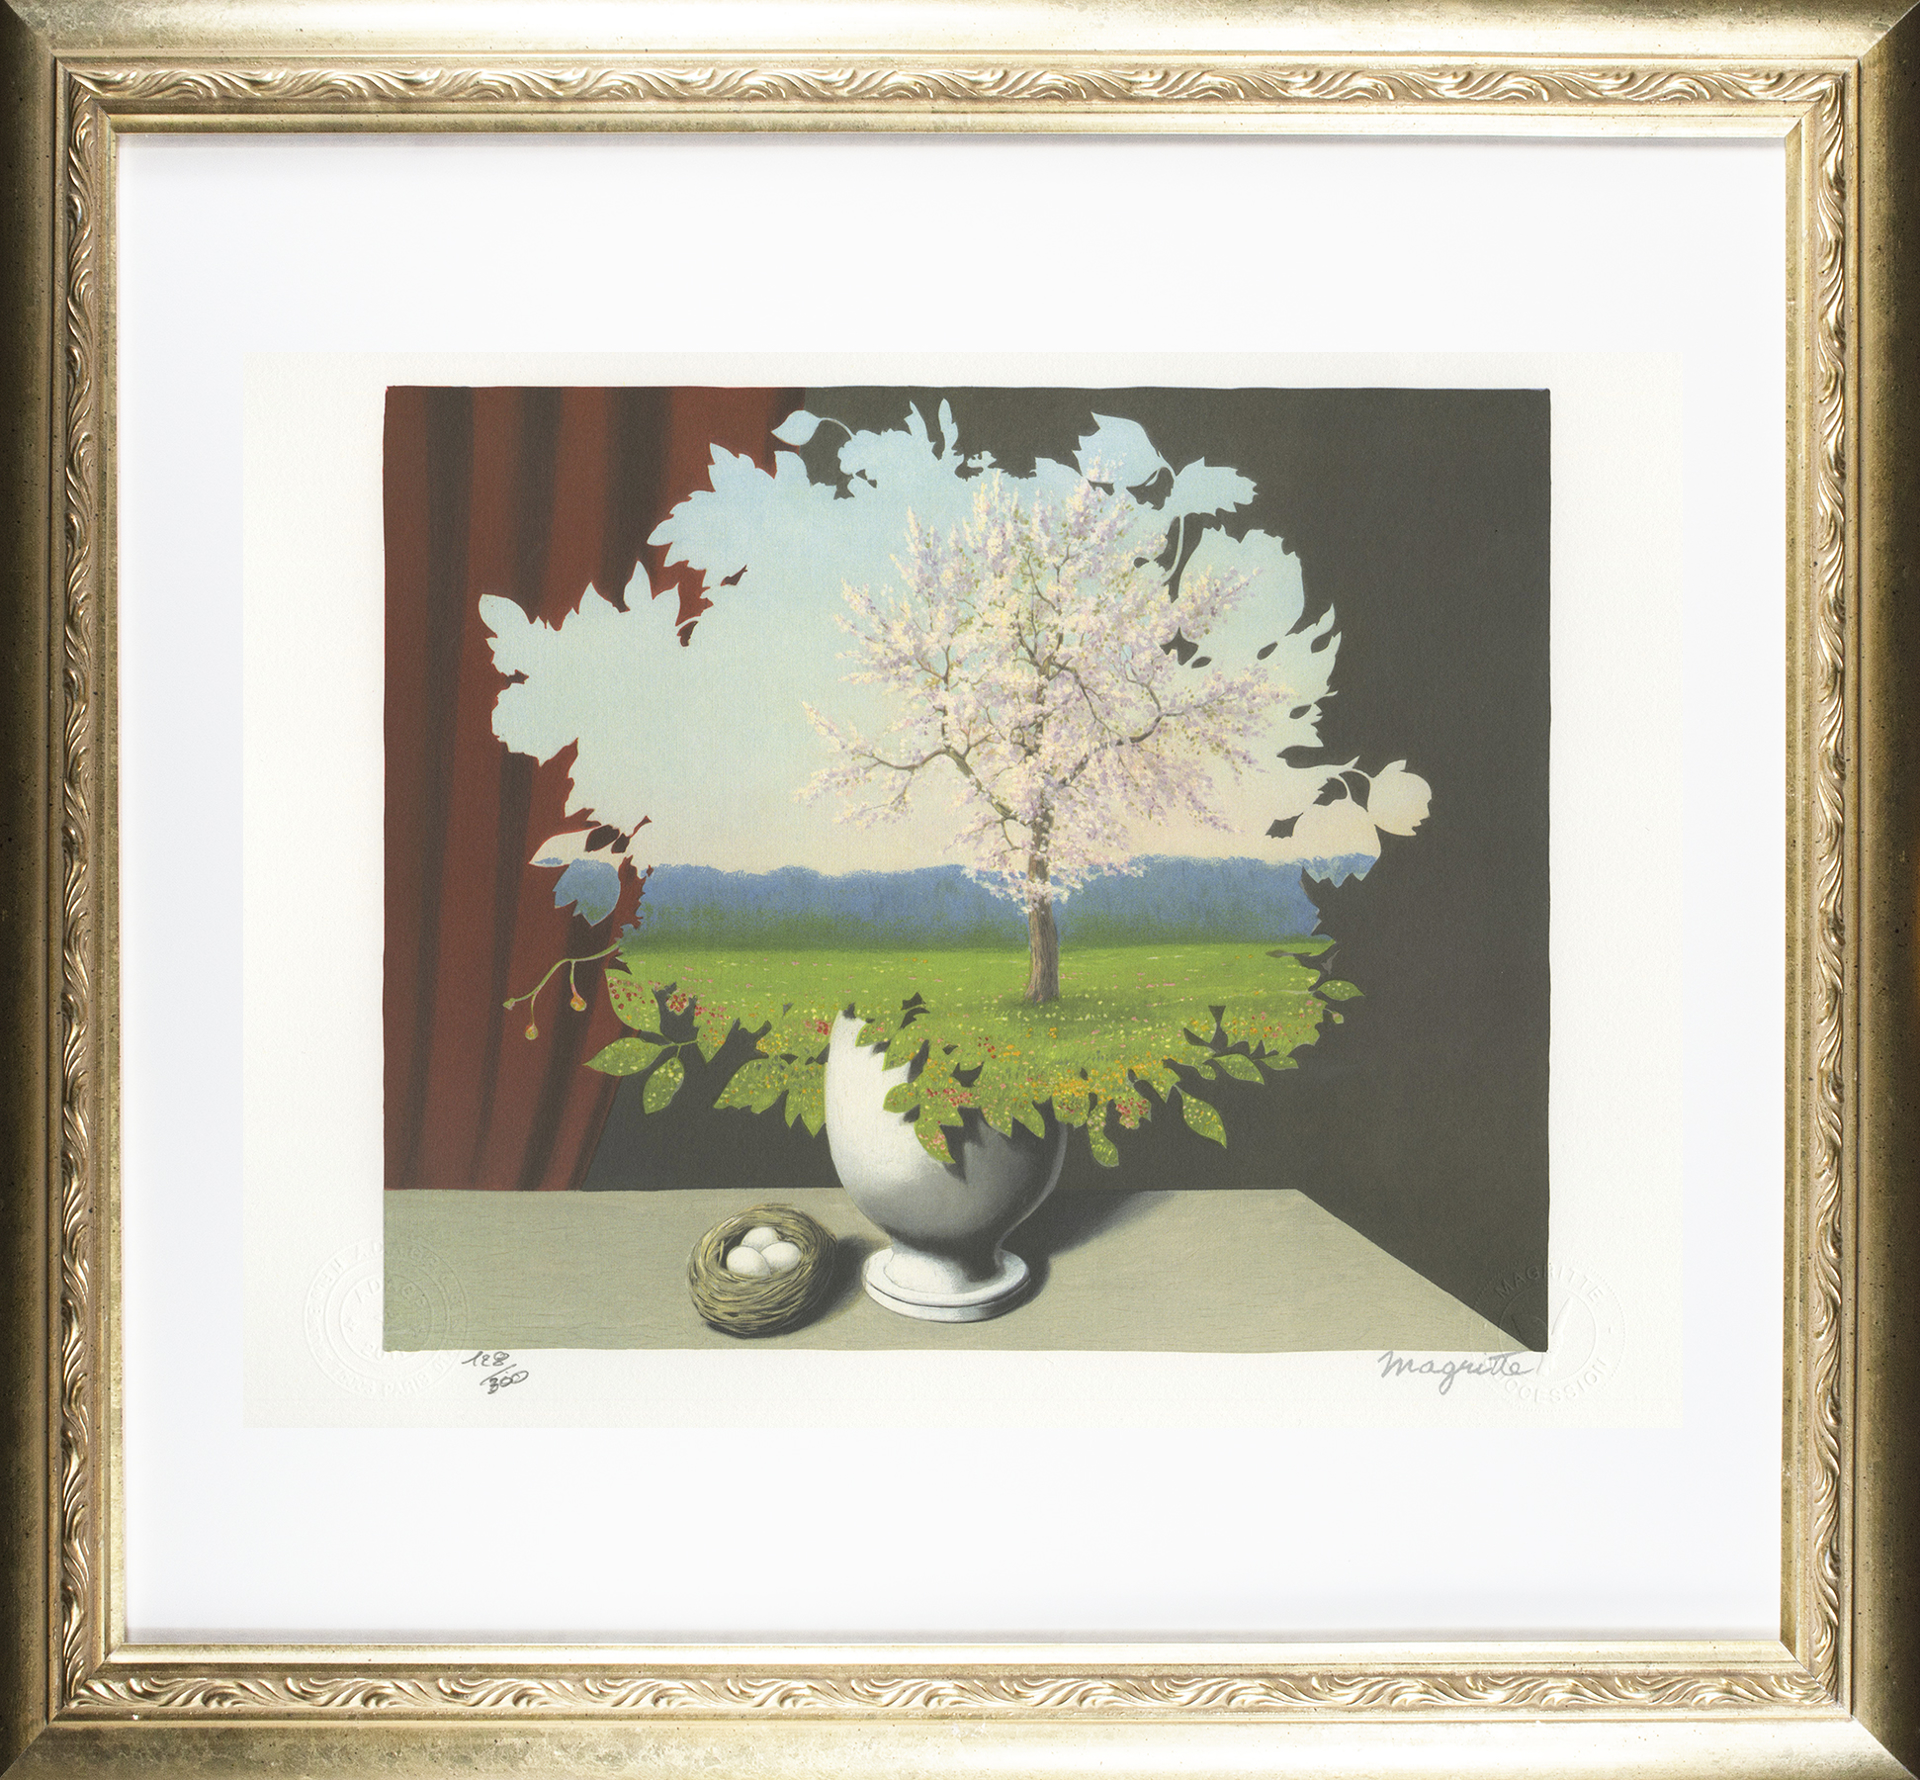 Le Plagiat (Plagiarism) by Rene Magritte